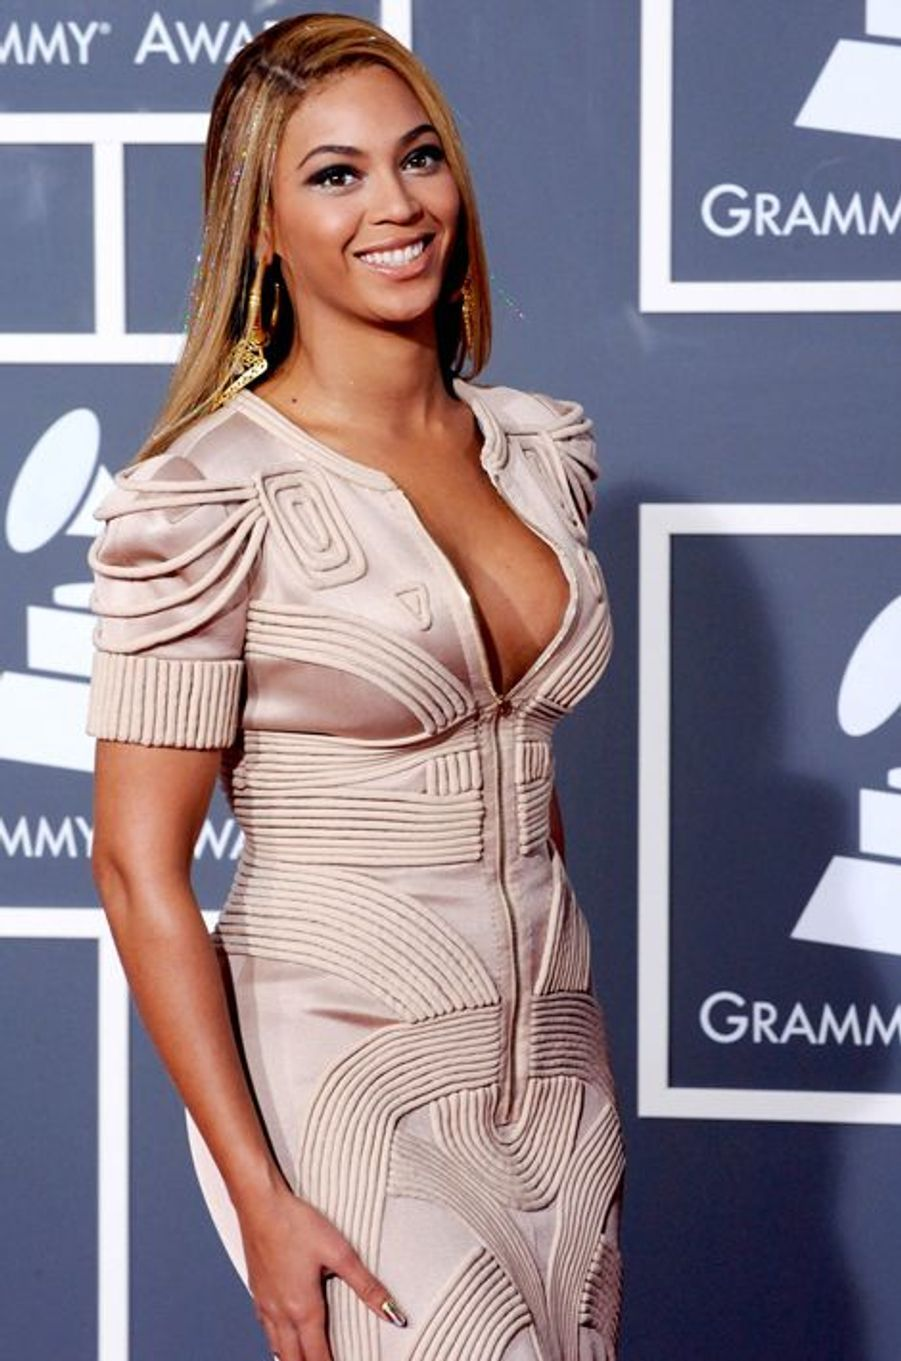 En janvier 2010 aux Grammy Awards